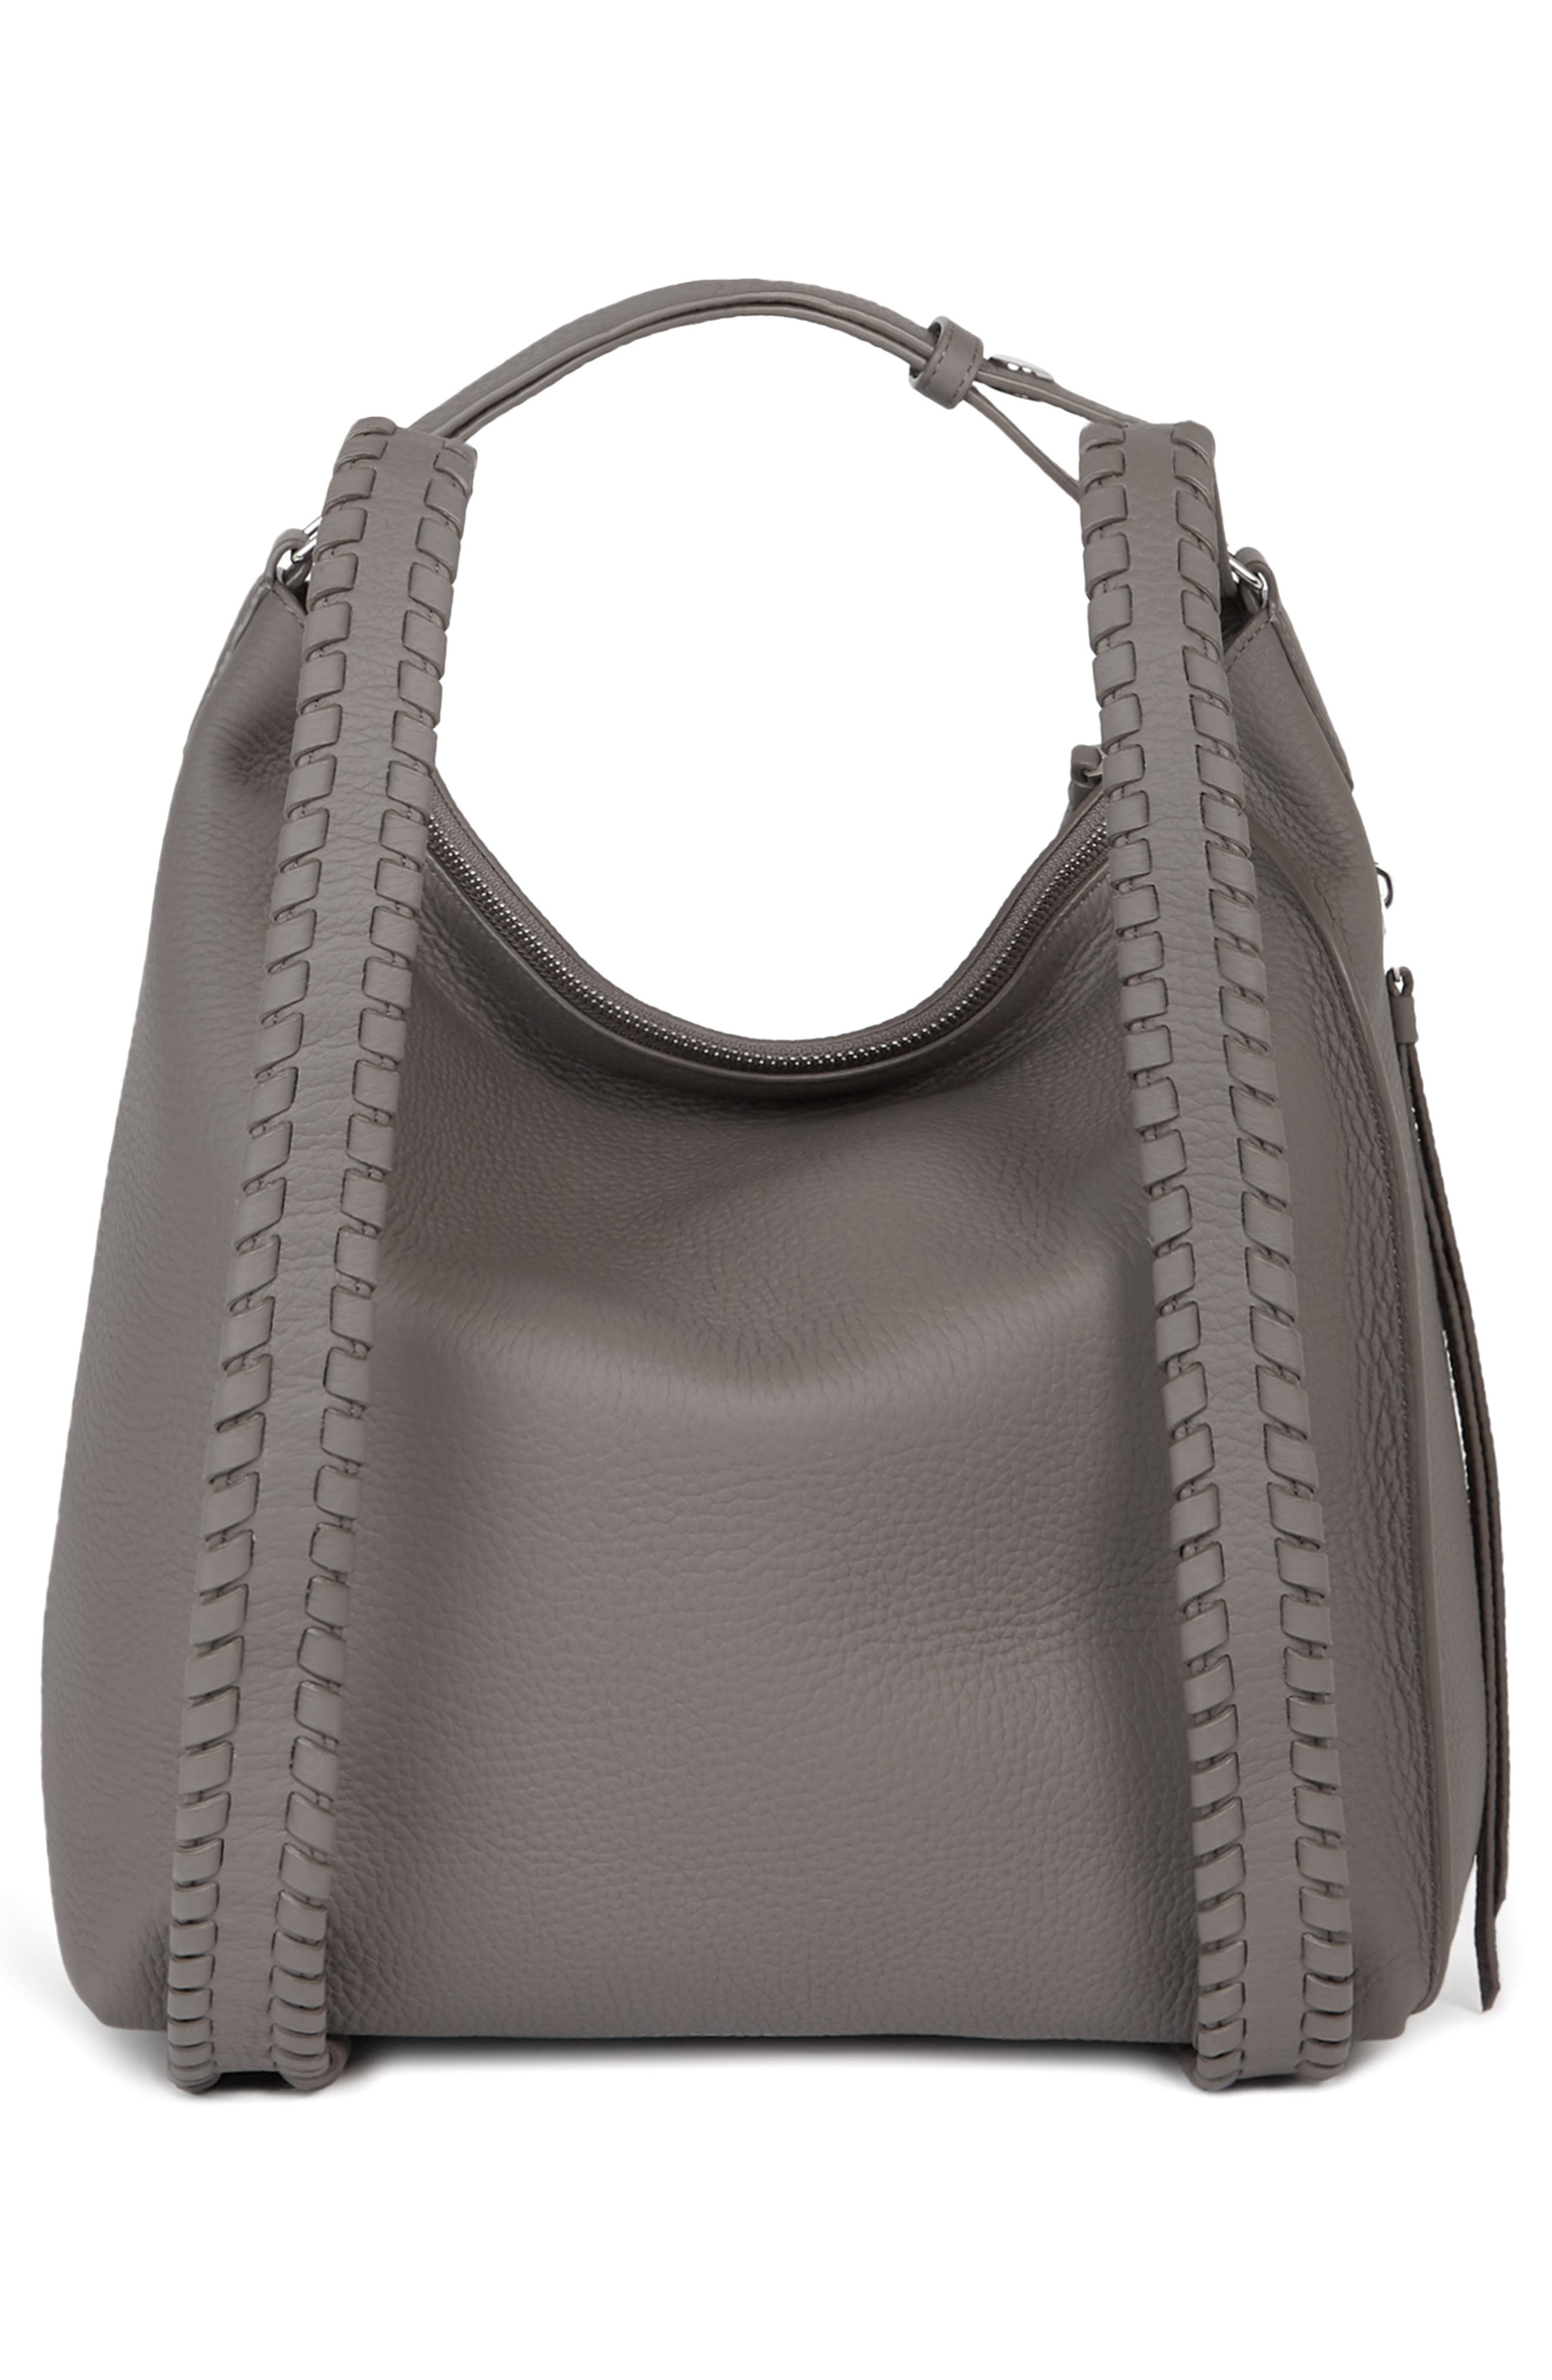 ALLSAINTS, Small Kita Convertible Leather Backpack, Alternate thumbnail 2, color, STORM GREY